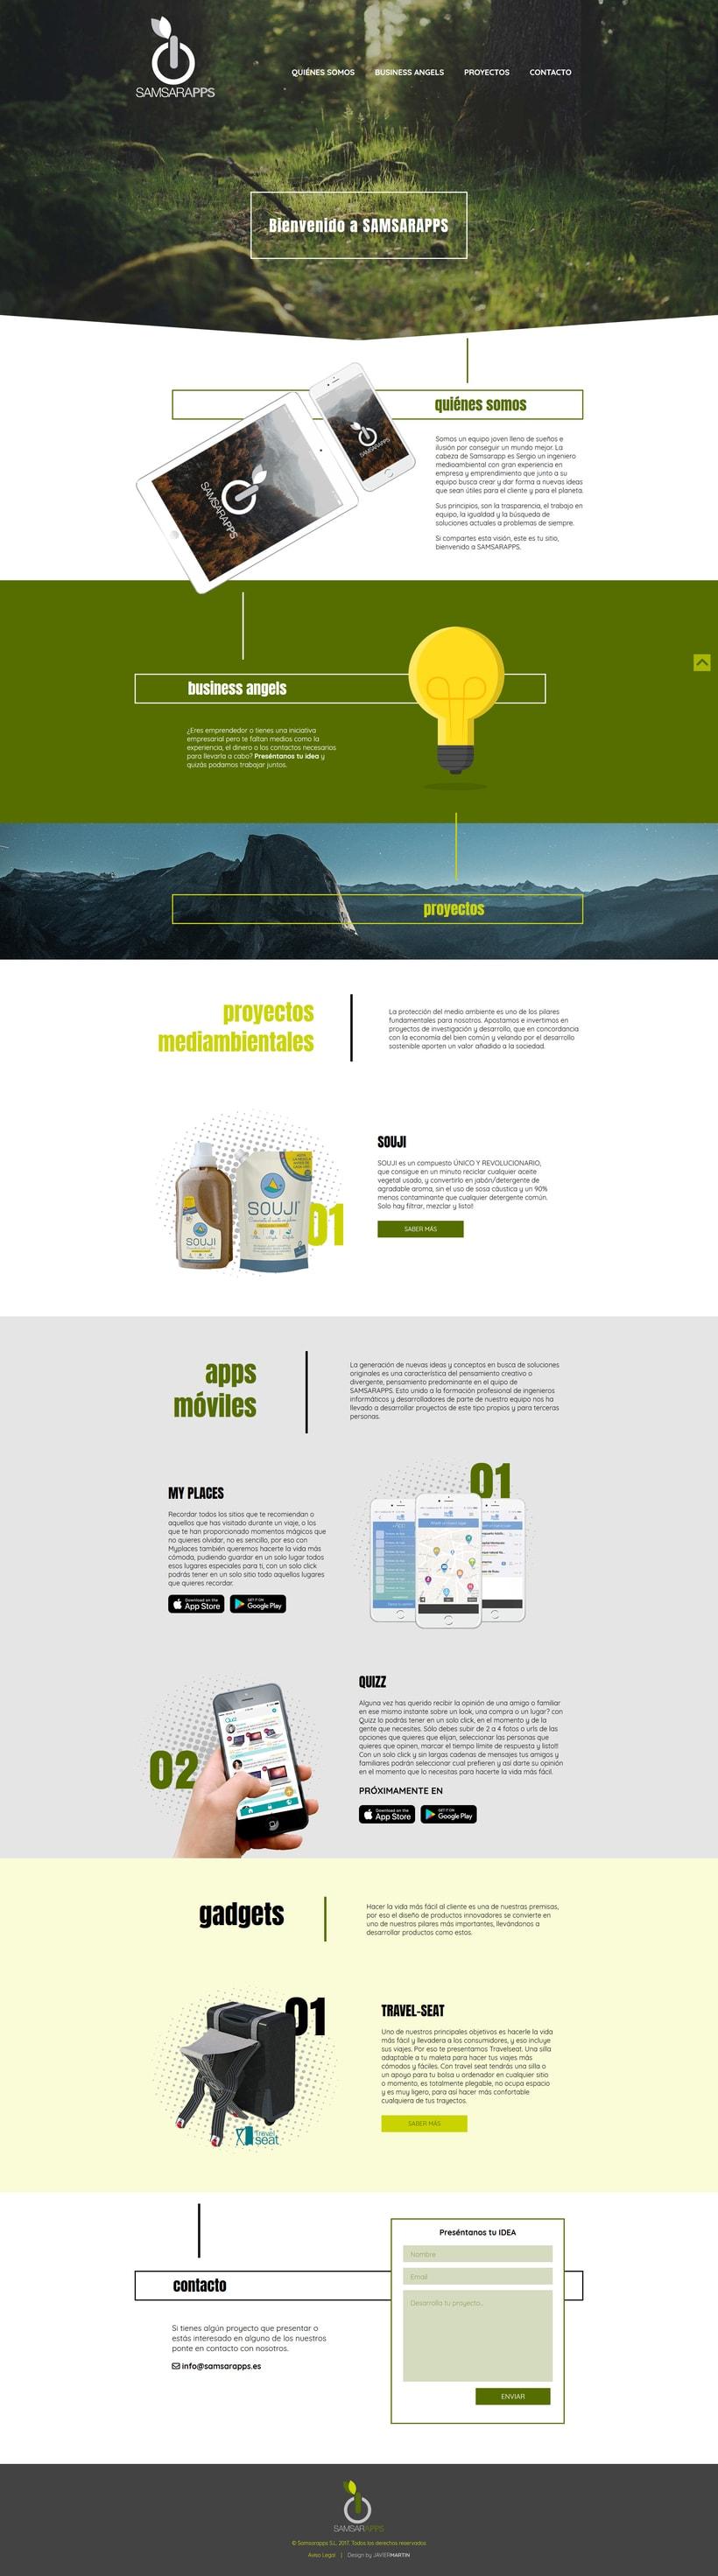 Página Web Corporativa para Samsarapps 1